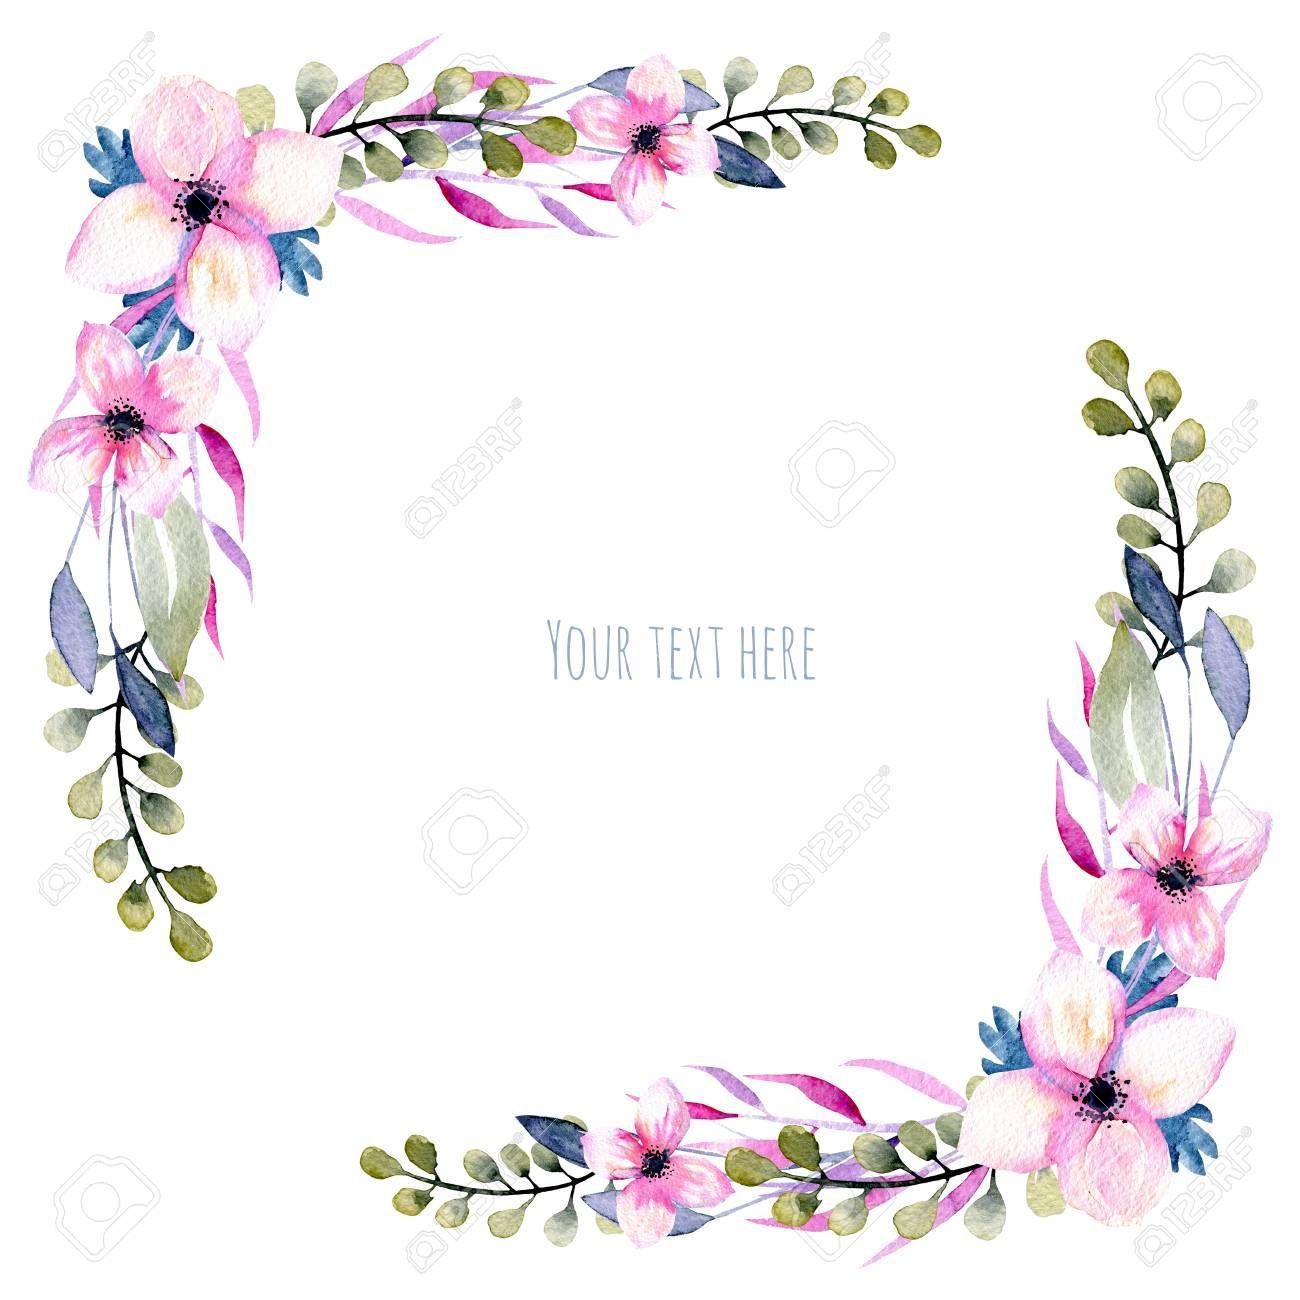 jpg download Wildflower clipart corner border flower. Stock photo skiss